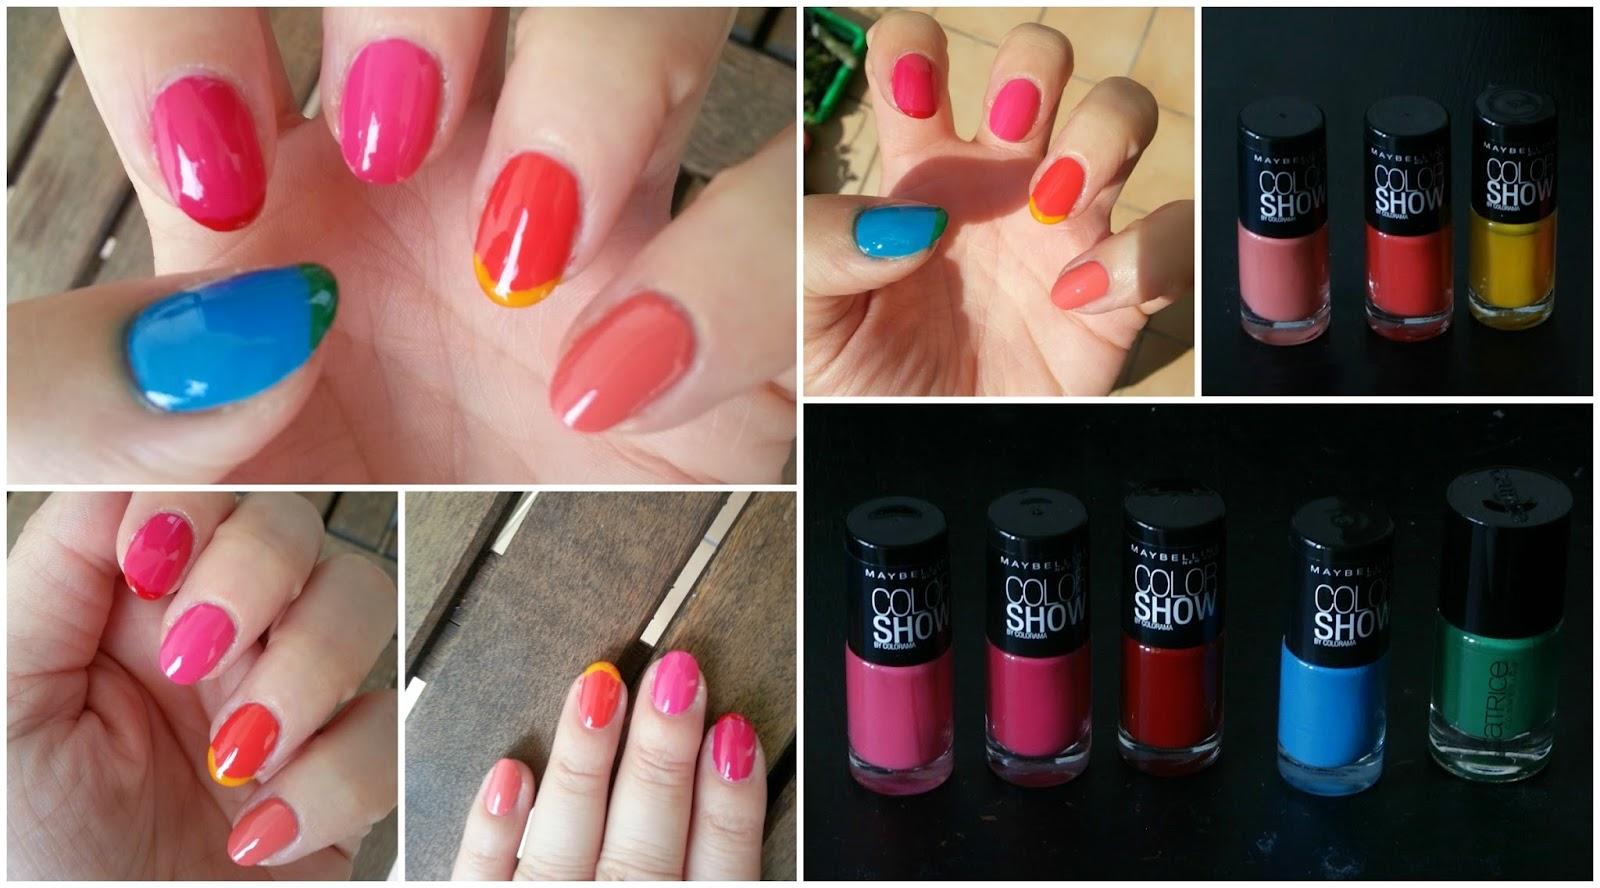 Colourful Nails